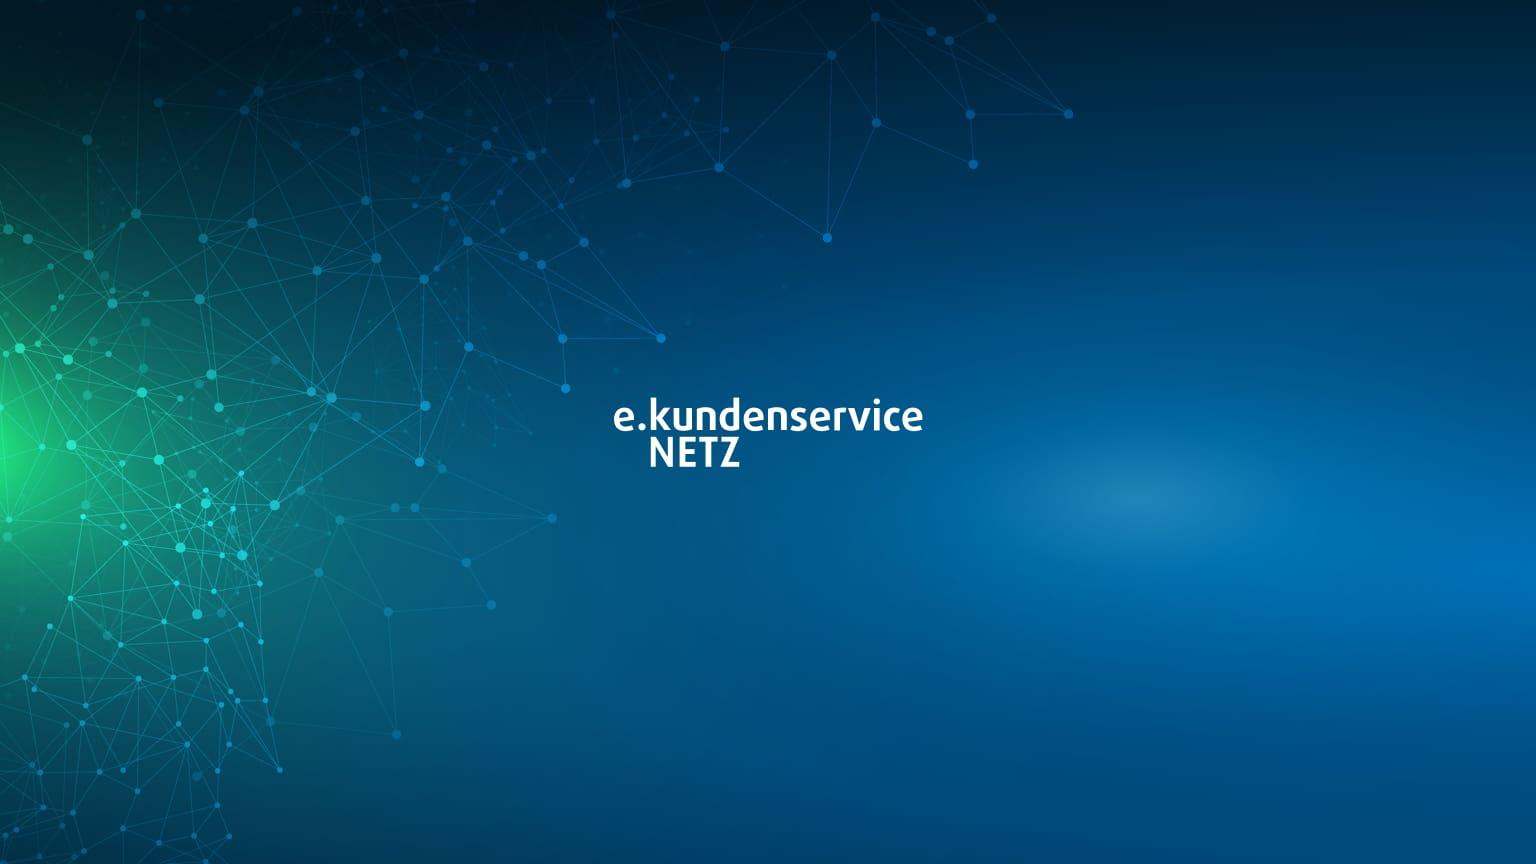 Touchscreen Intro - e.kundenservice Netz